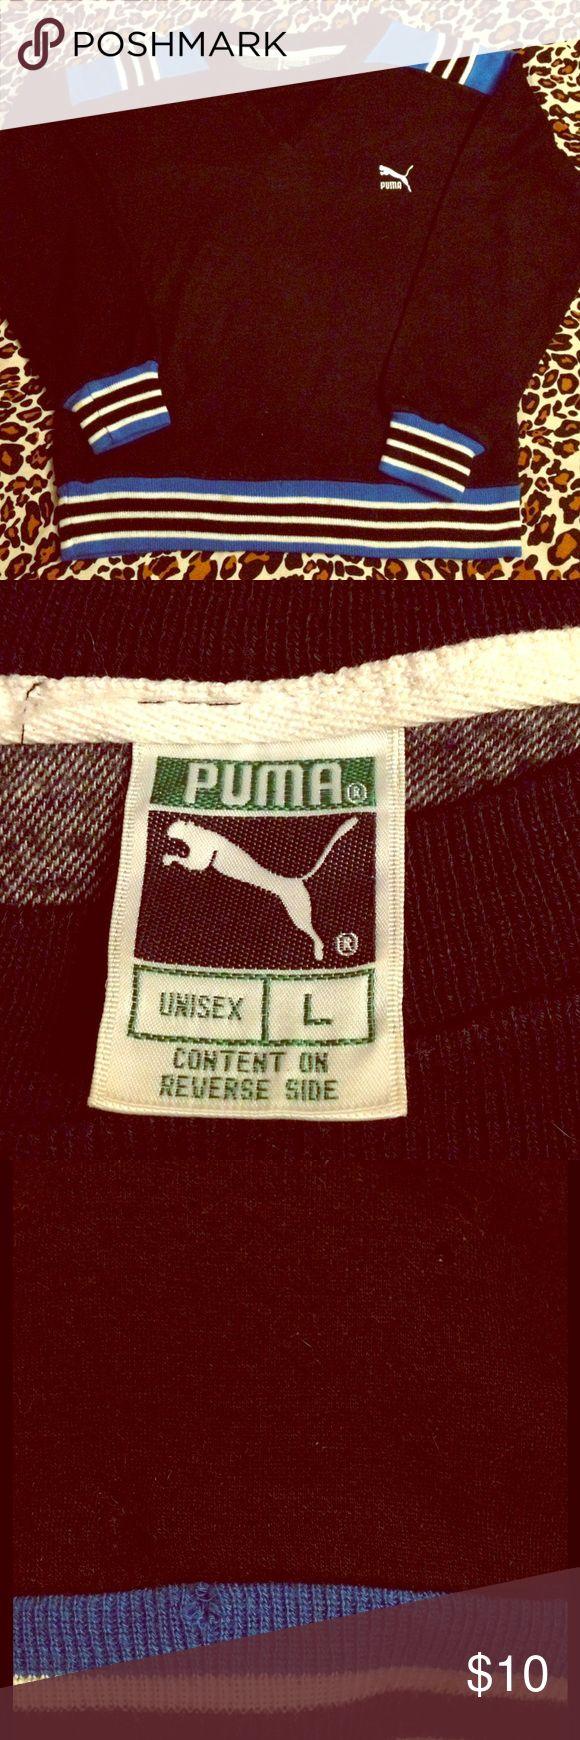 True Vintage Puma Sweatshirt Adult S/ Kids L True vintage Puma sweatshirt! 3 small holes in front, but they don't go all the way through ... Fair vintage condition. Puma Tops Sweatshirts & Hoodies